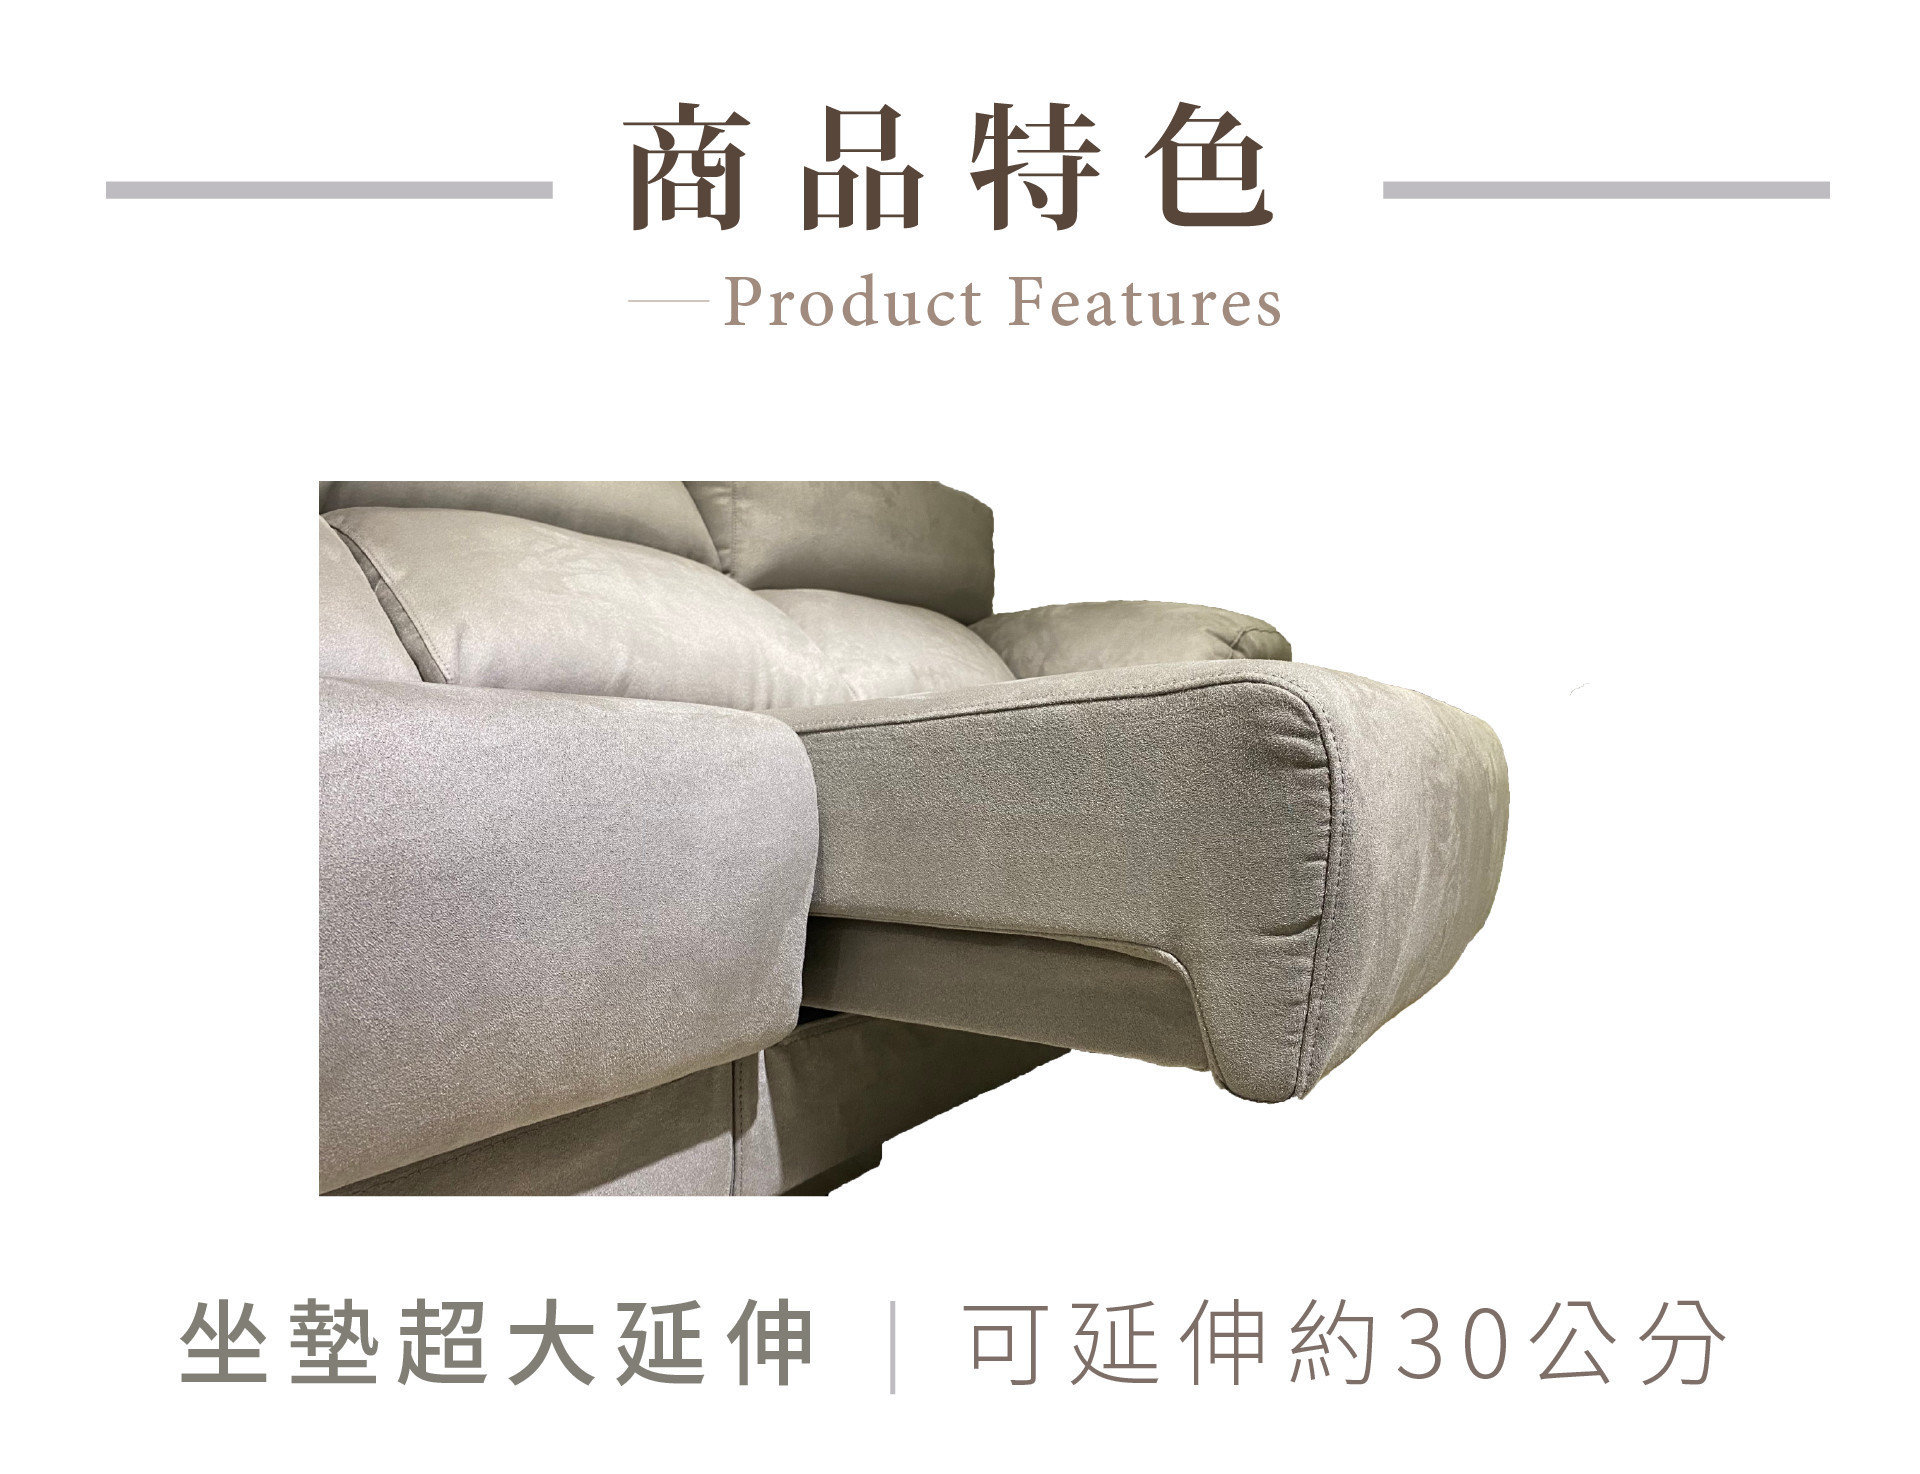 LONG LEGS 長腿叔叔沙發商品特色:坐墊最高可延伸30公分,是市面上的三倍!